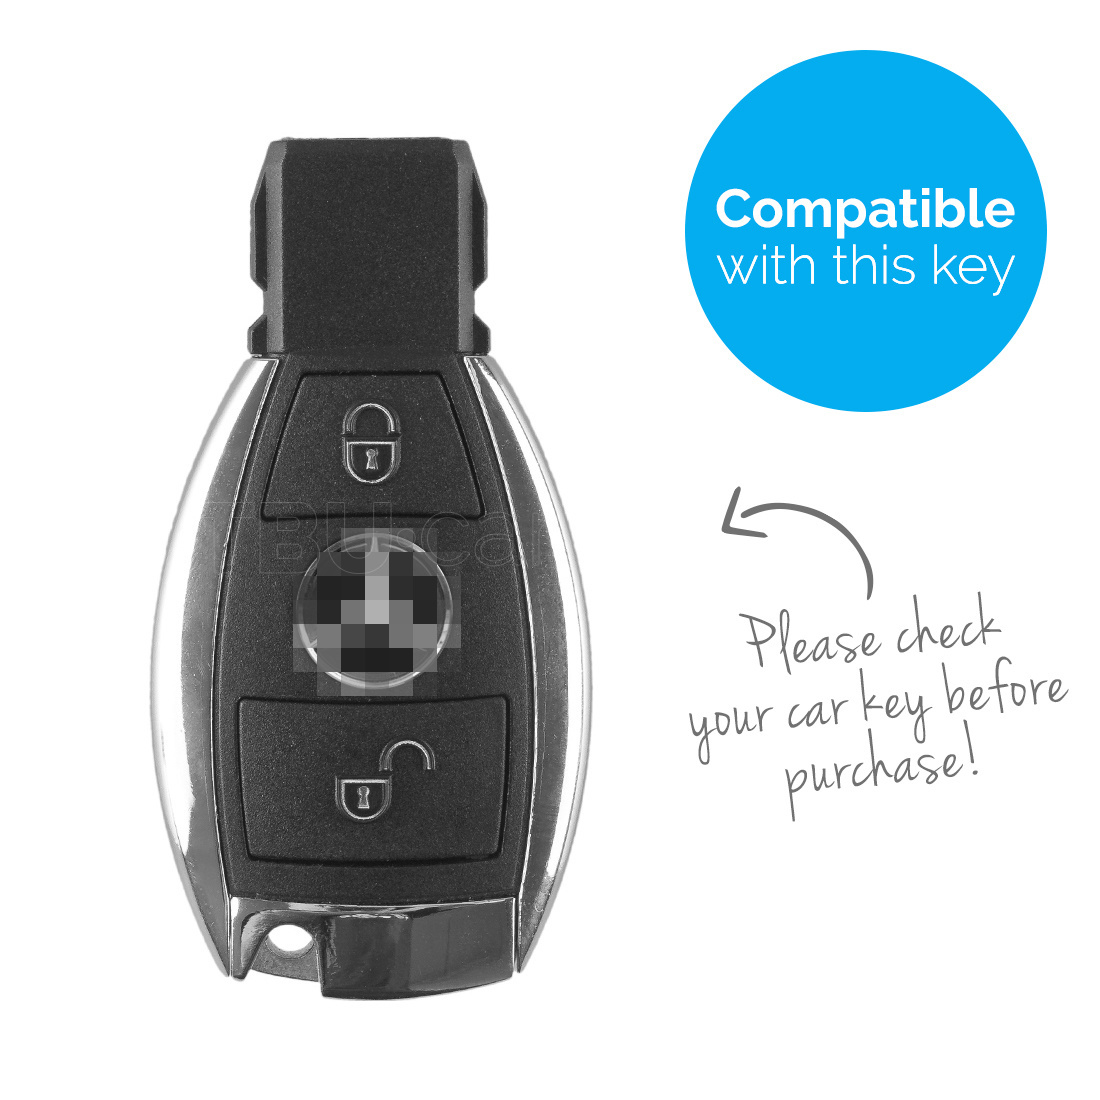 TBU car TBU car Sleutel cover compatibel met Mercedes - Silicone sleutelhoesje - beschermhoesje autosleutel - Rood